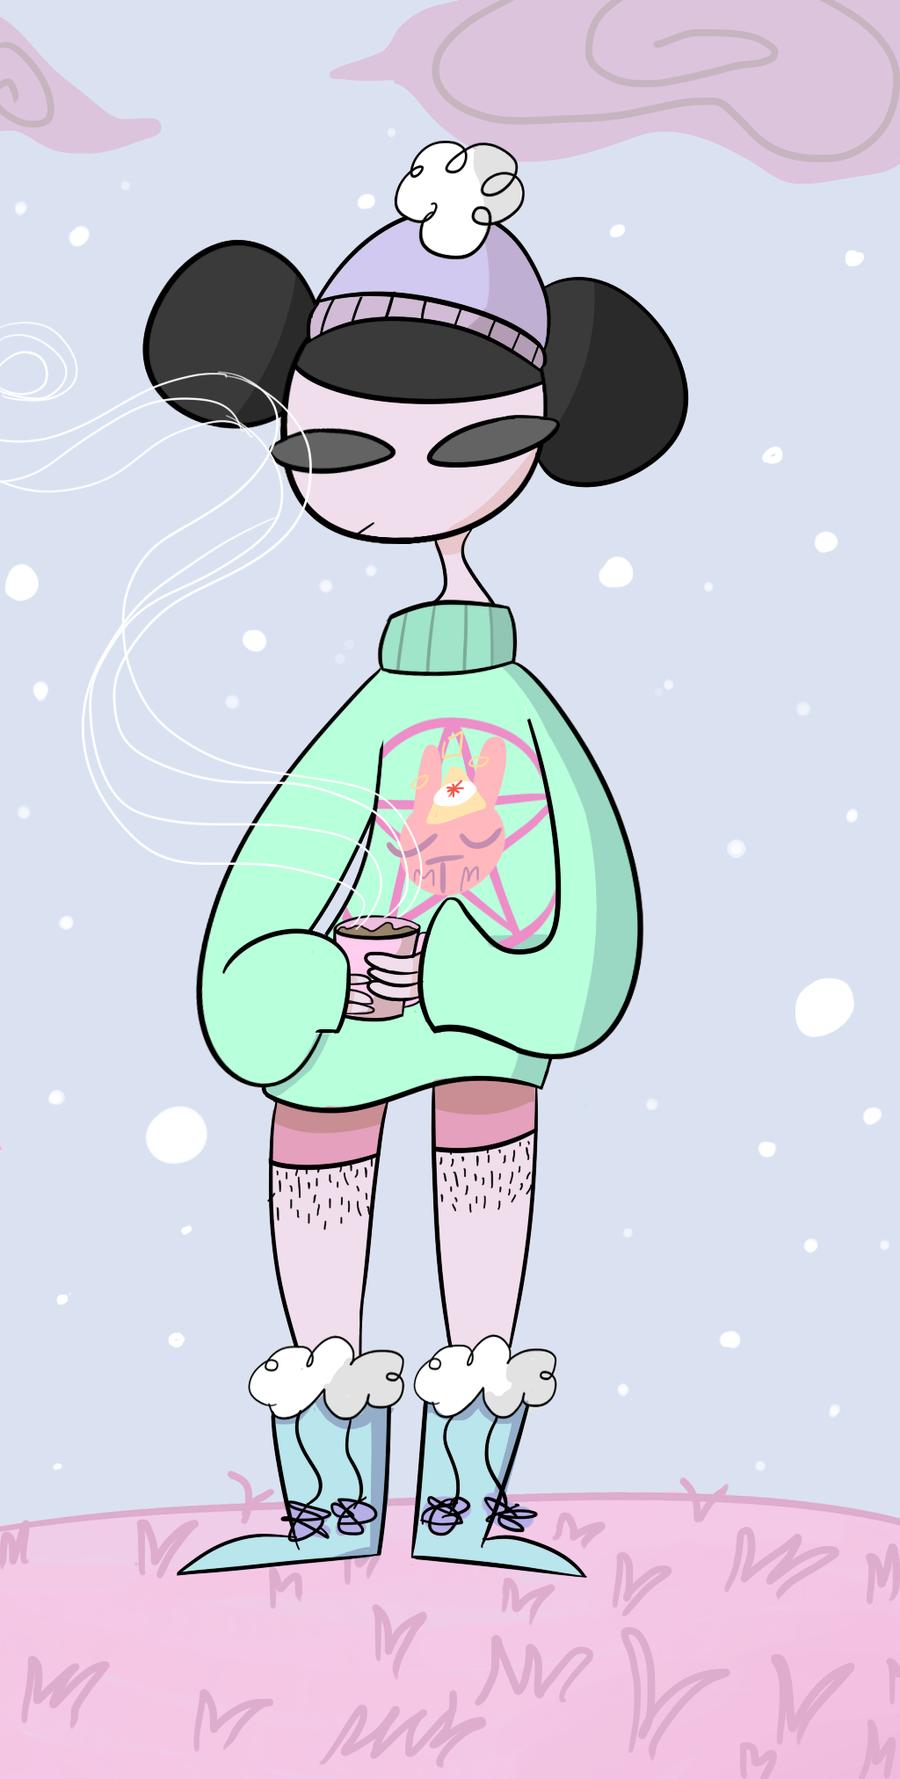 winter is warmer by ectoqueen on DeviantArt